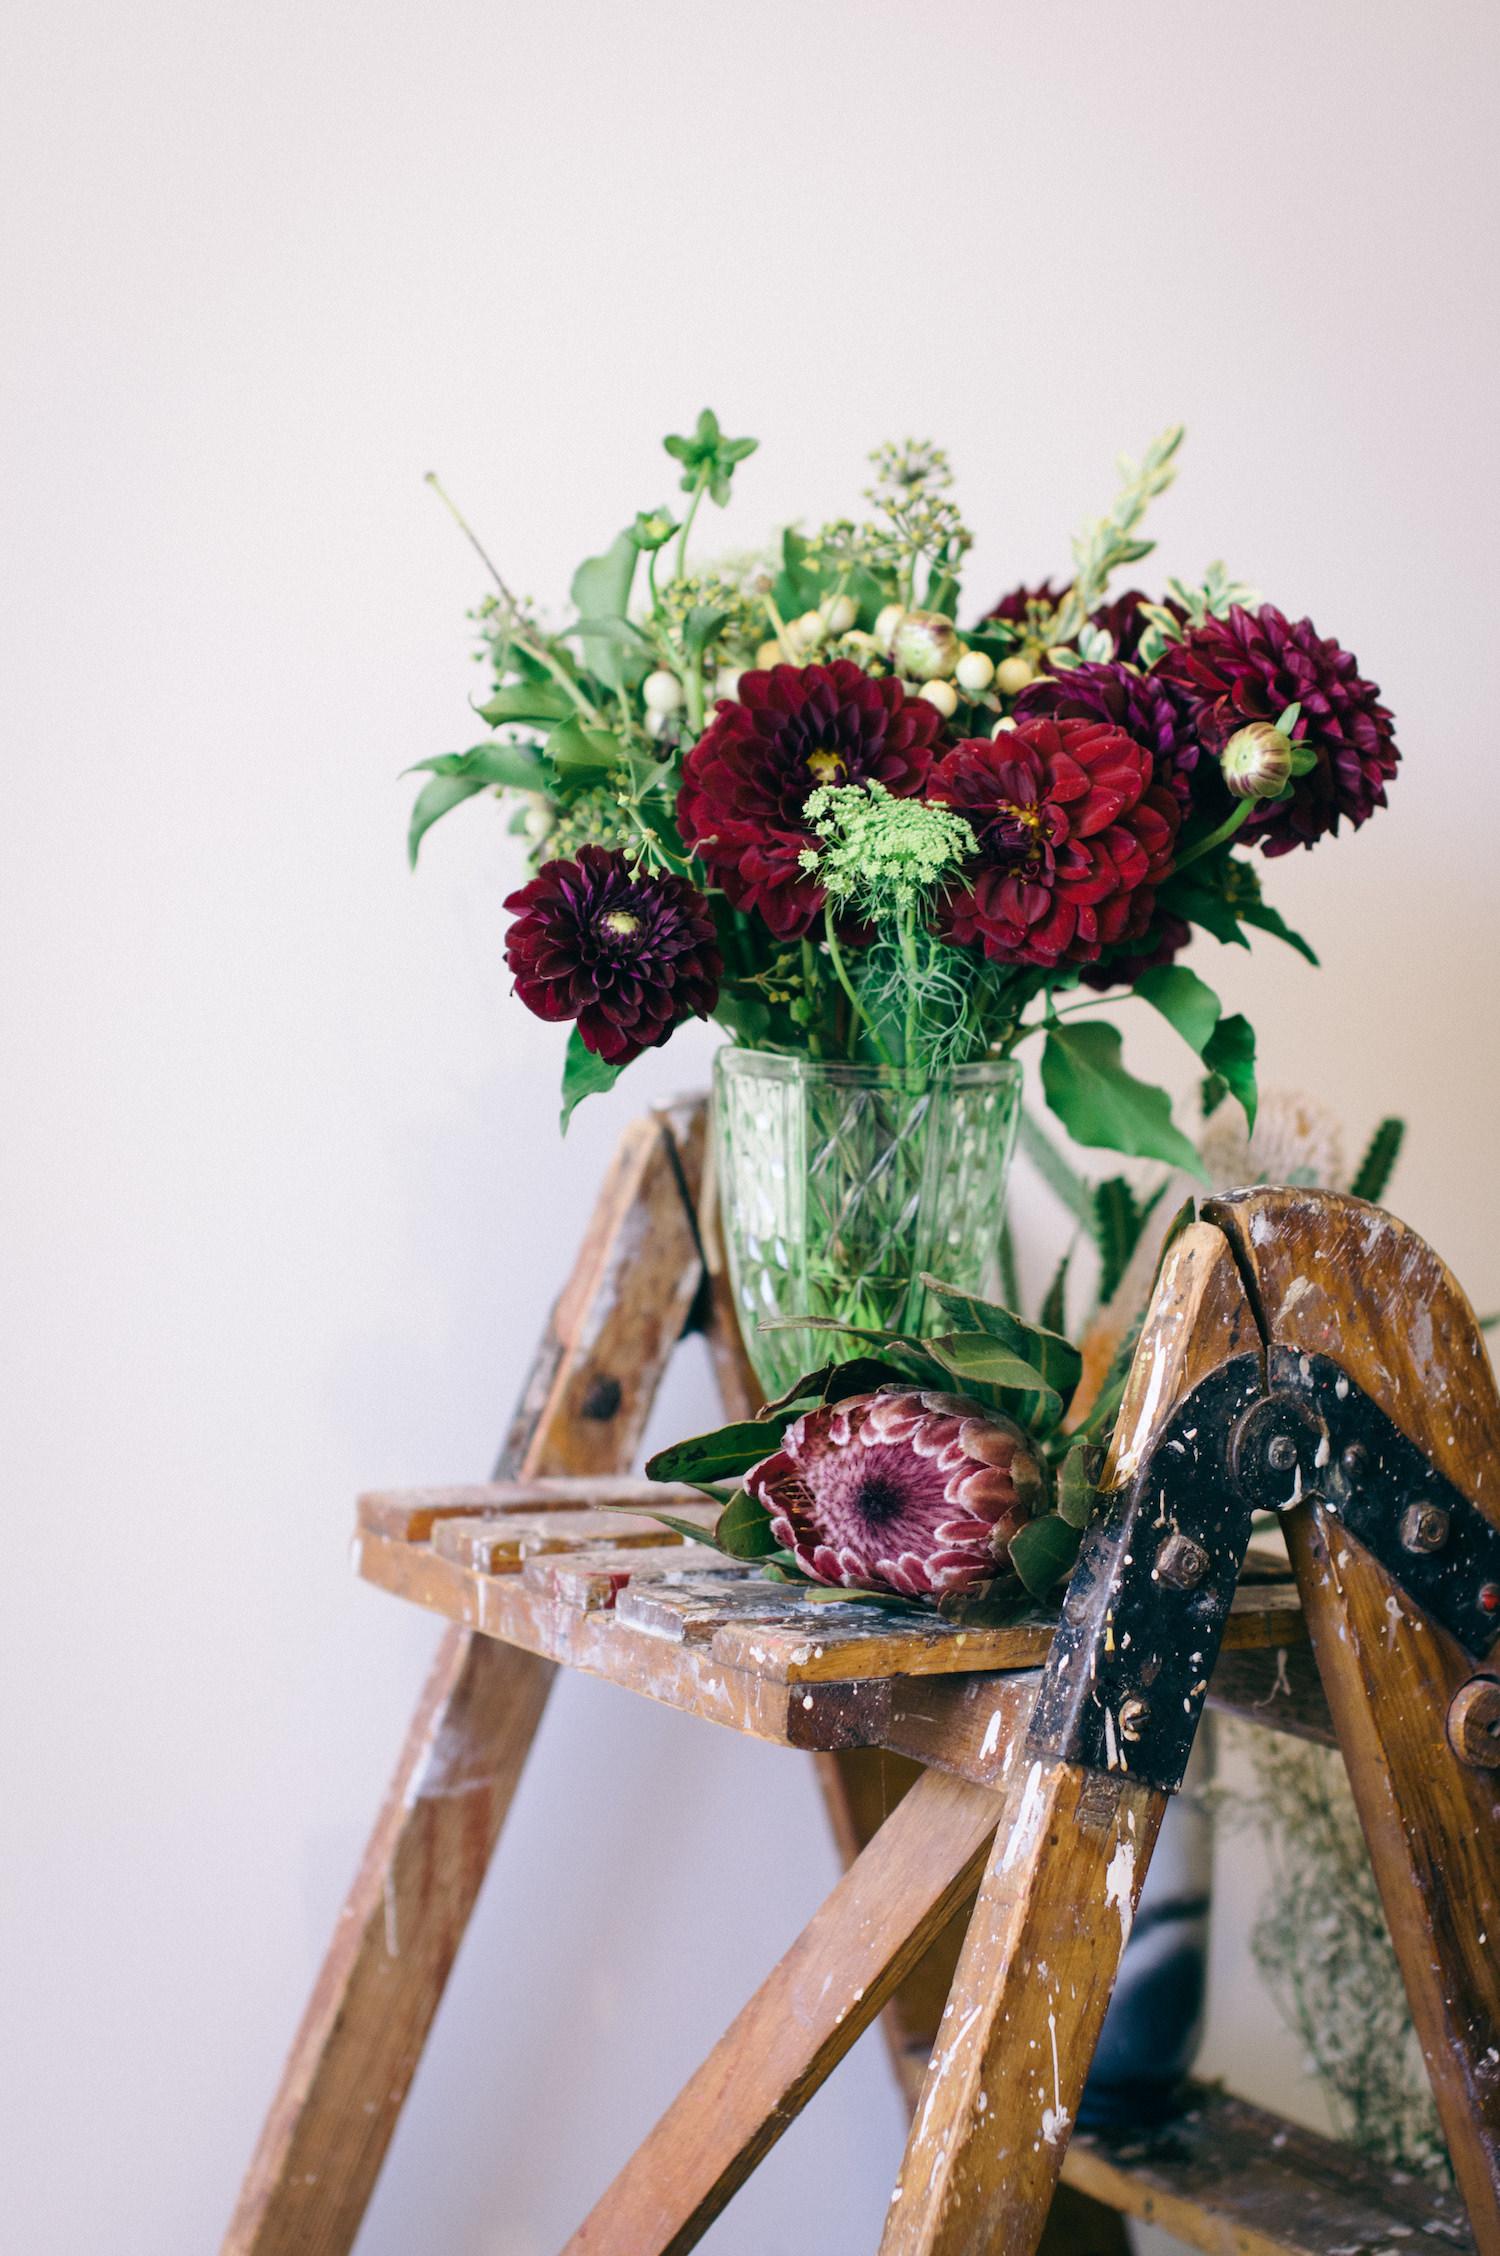 Creative Business Photography Ashleigh Perrella Artist Florist 13